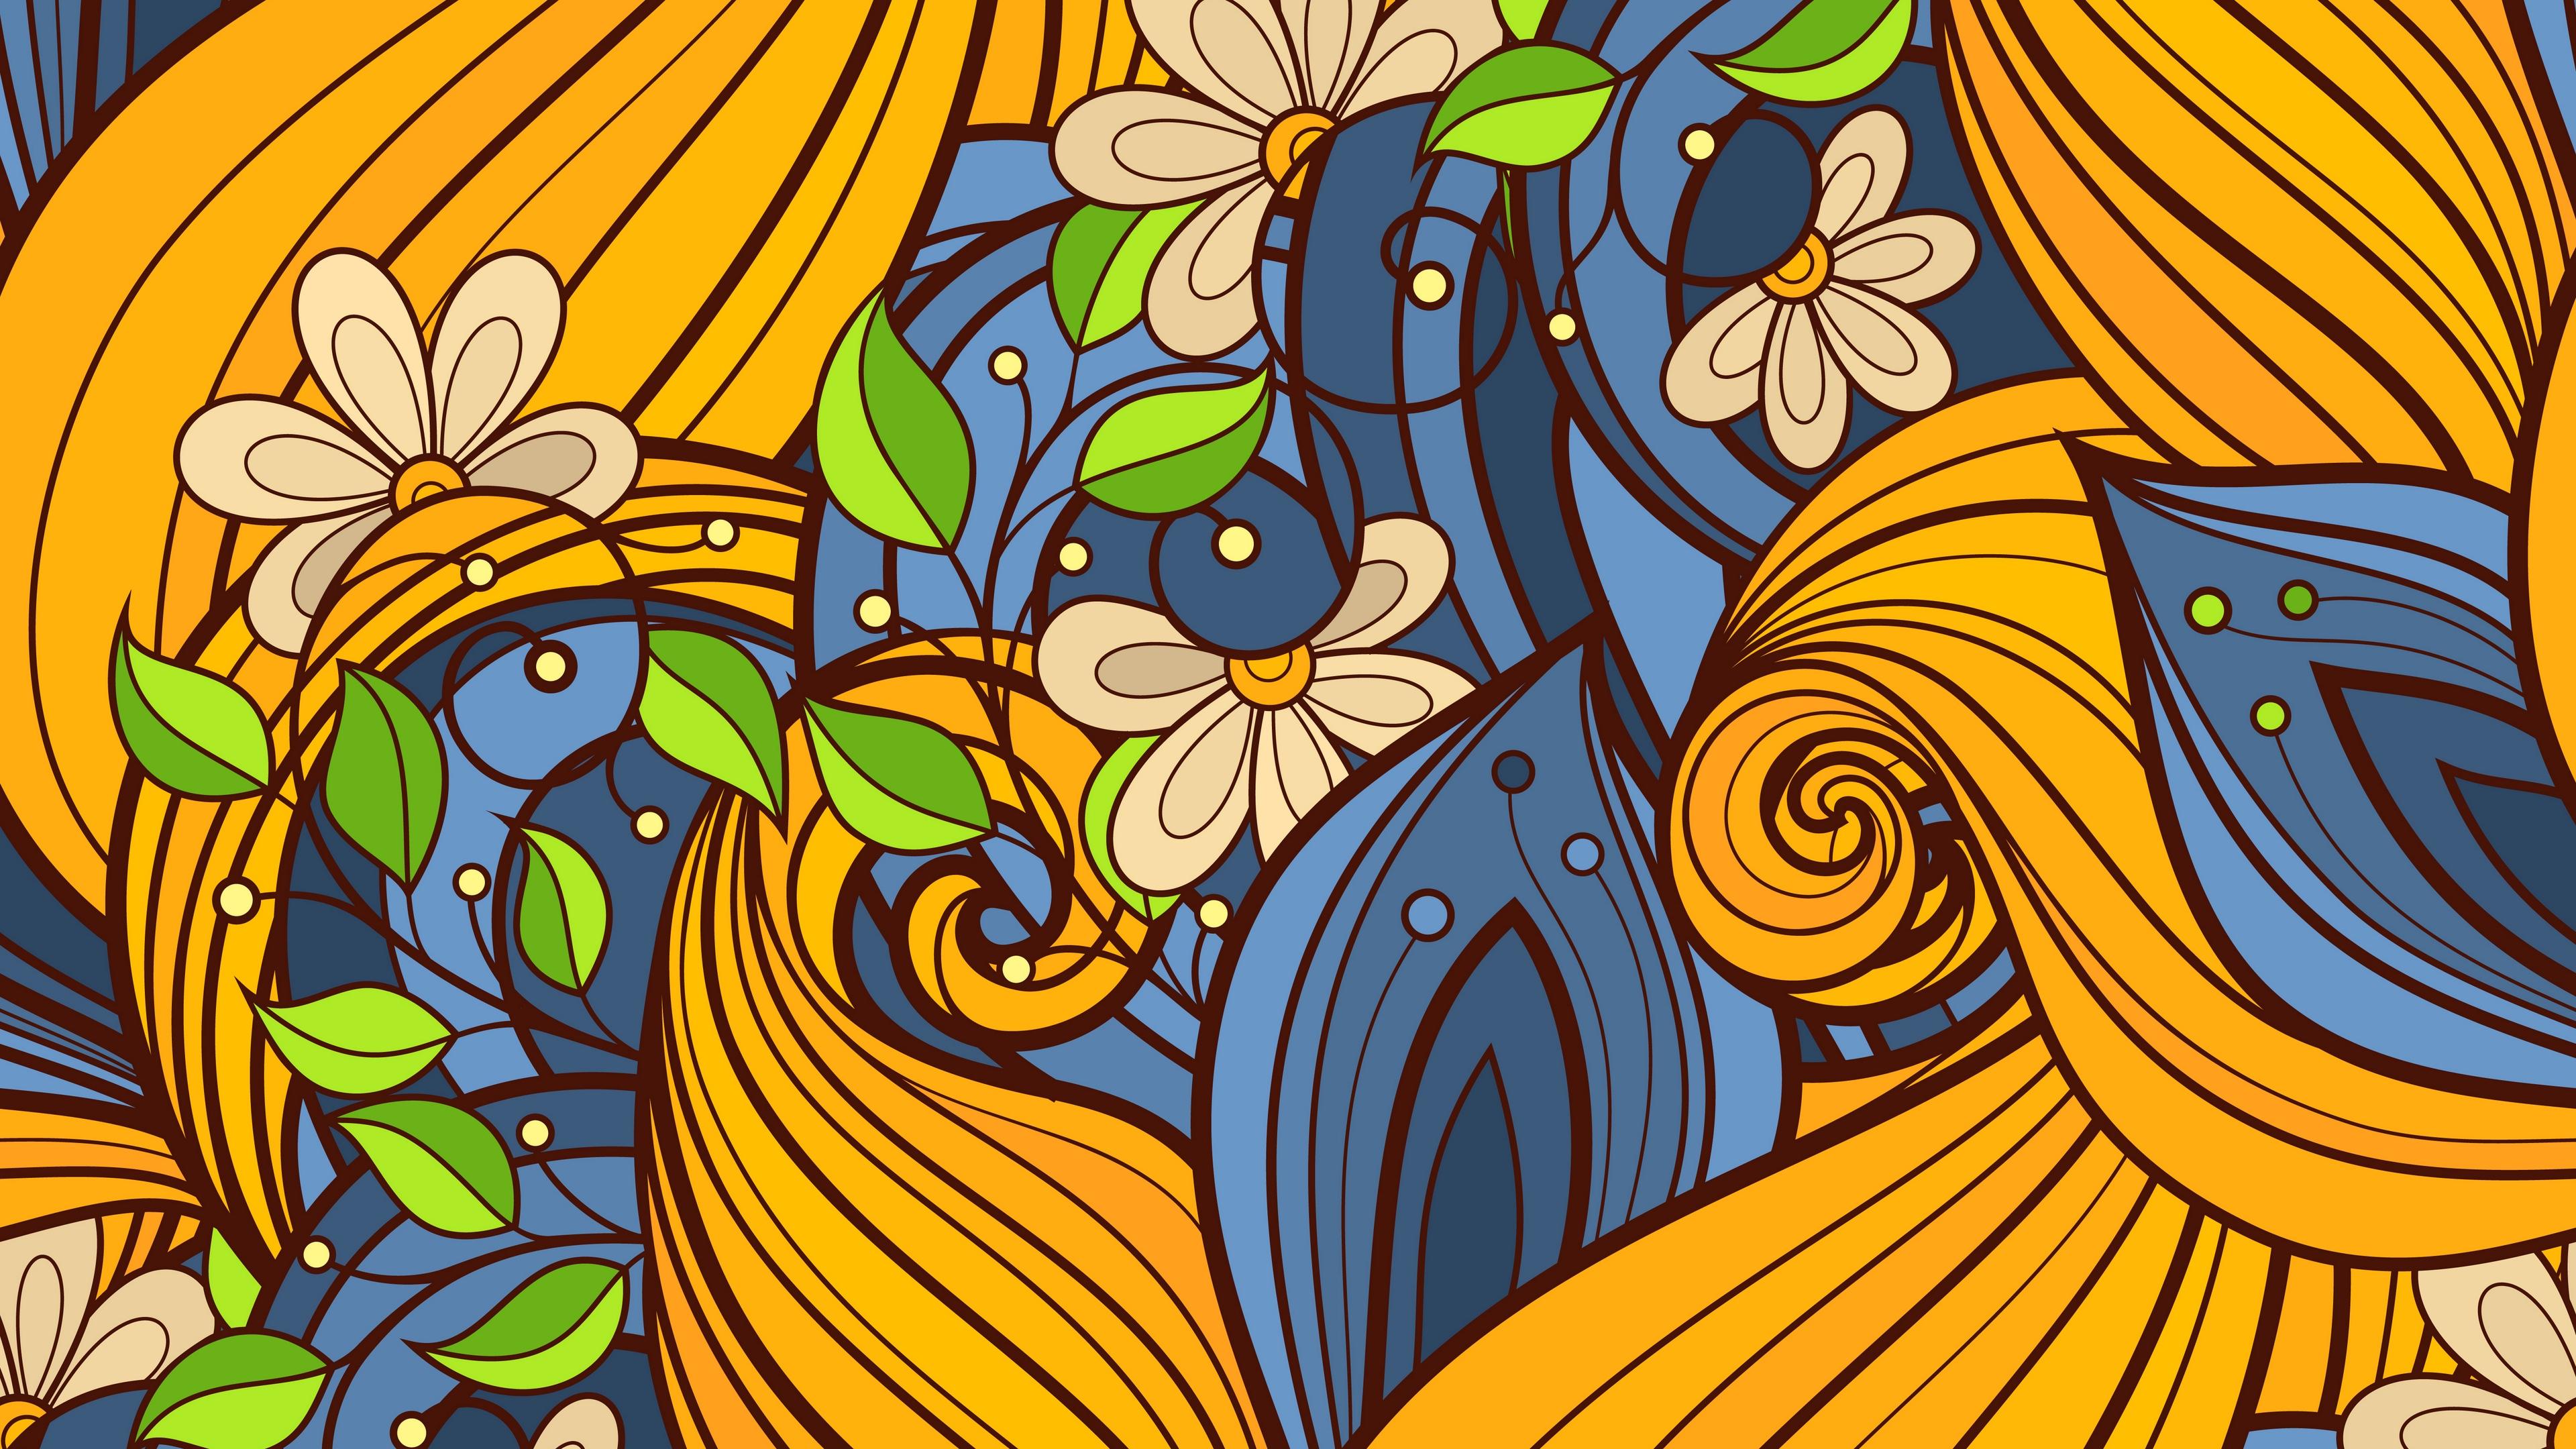 Download wallpaper 3840x2160 patterns, flowers, ornament.